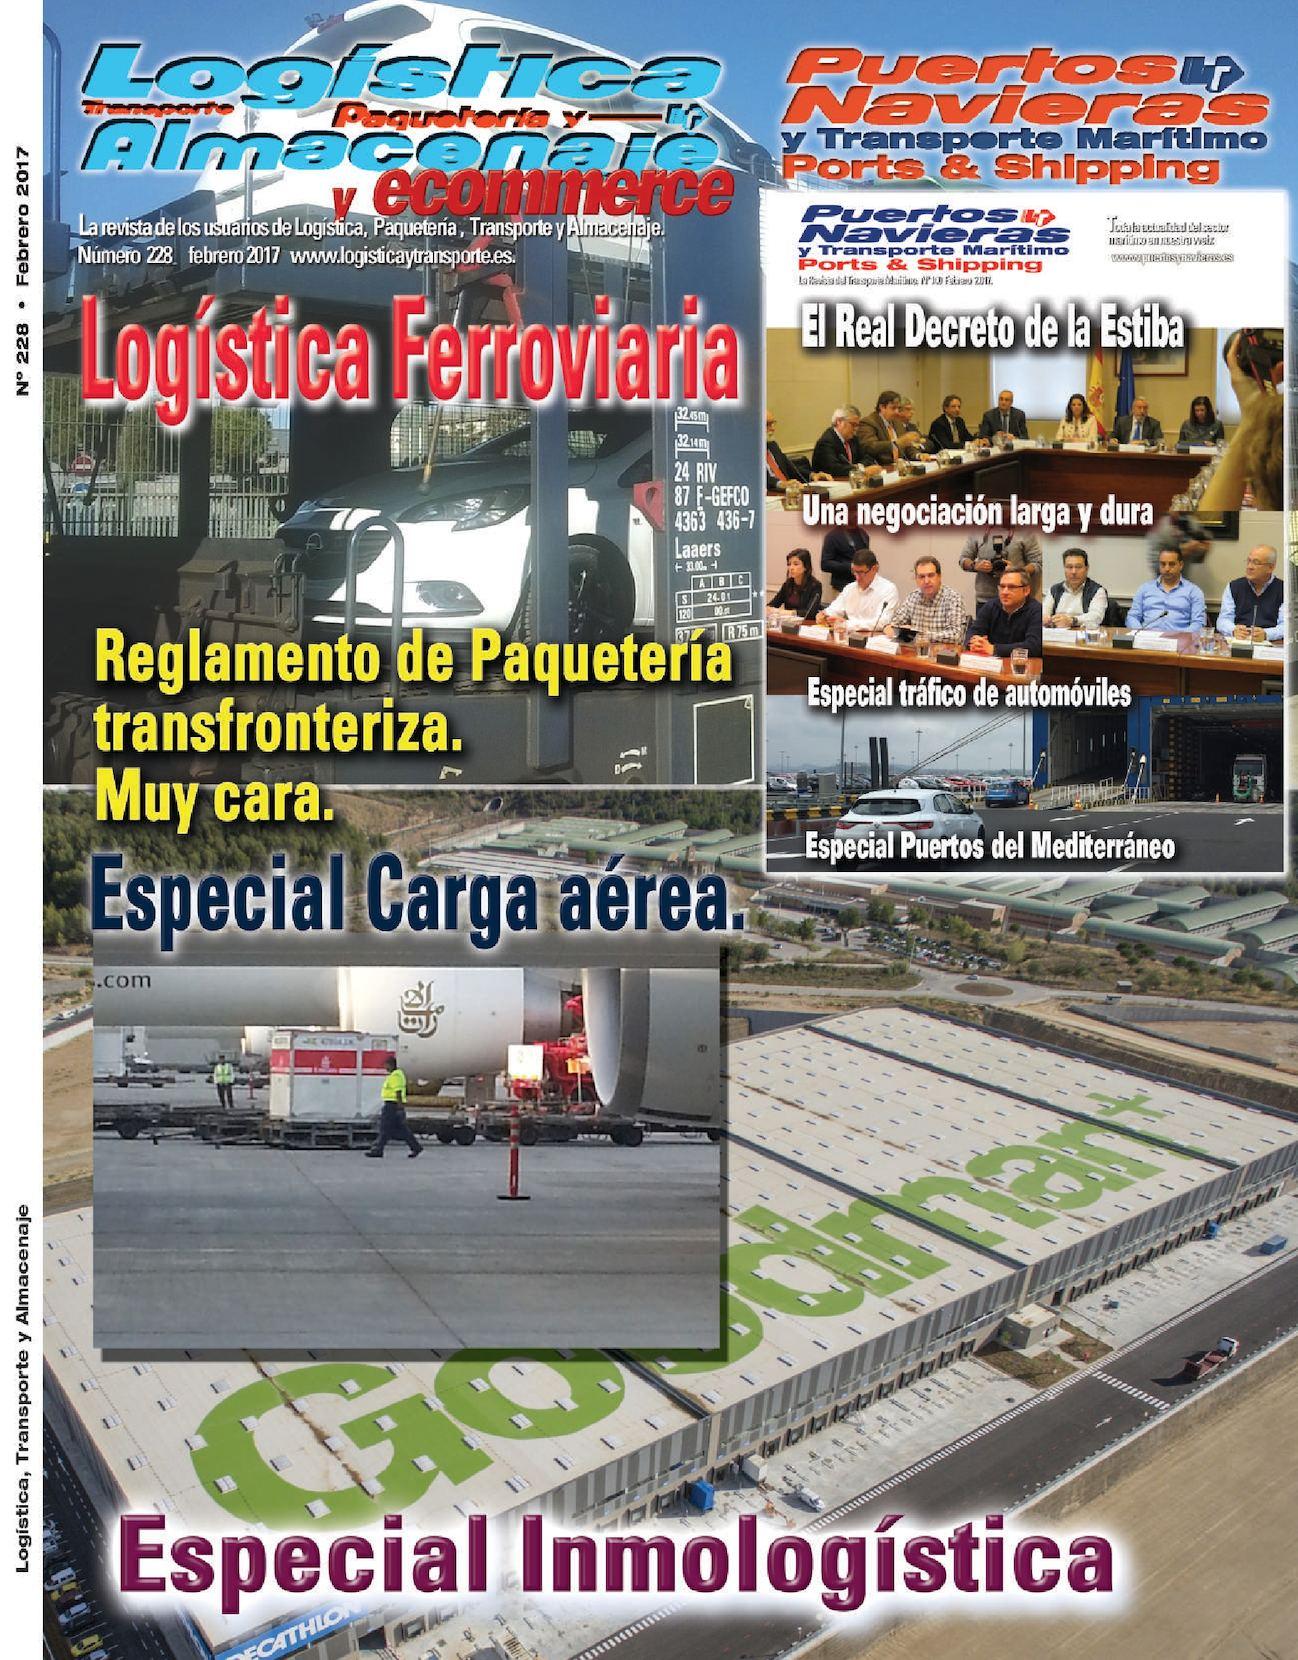 Logistica Transporte y Almacenaje 228 Febrero 2017